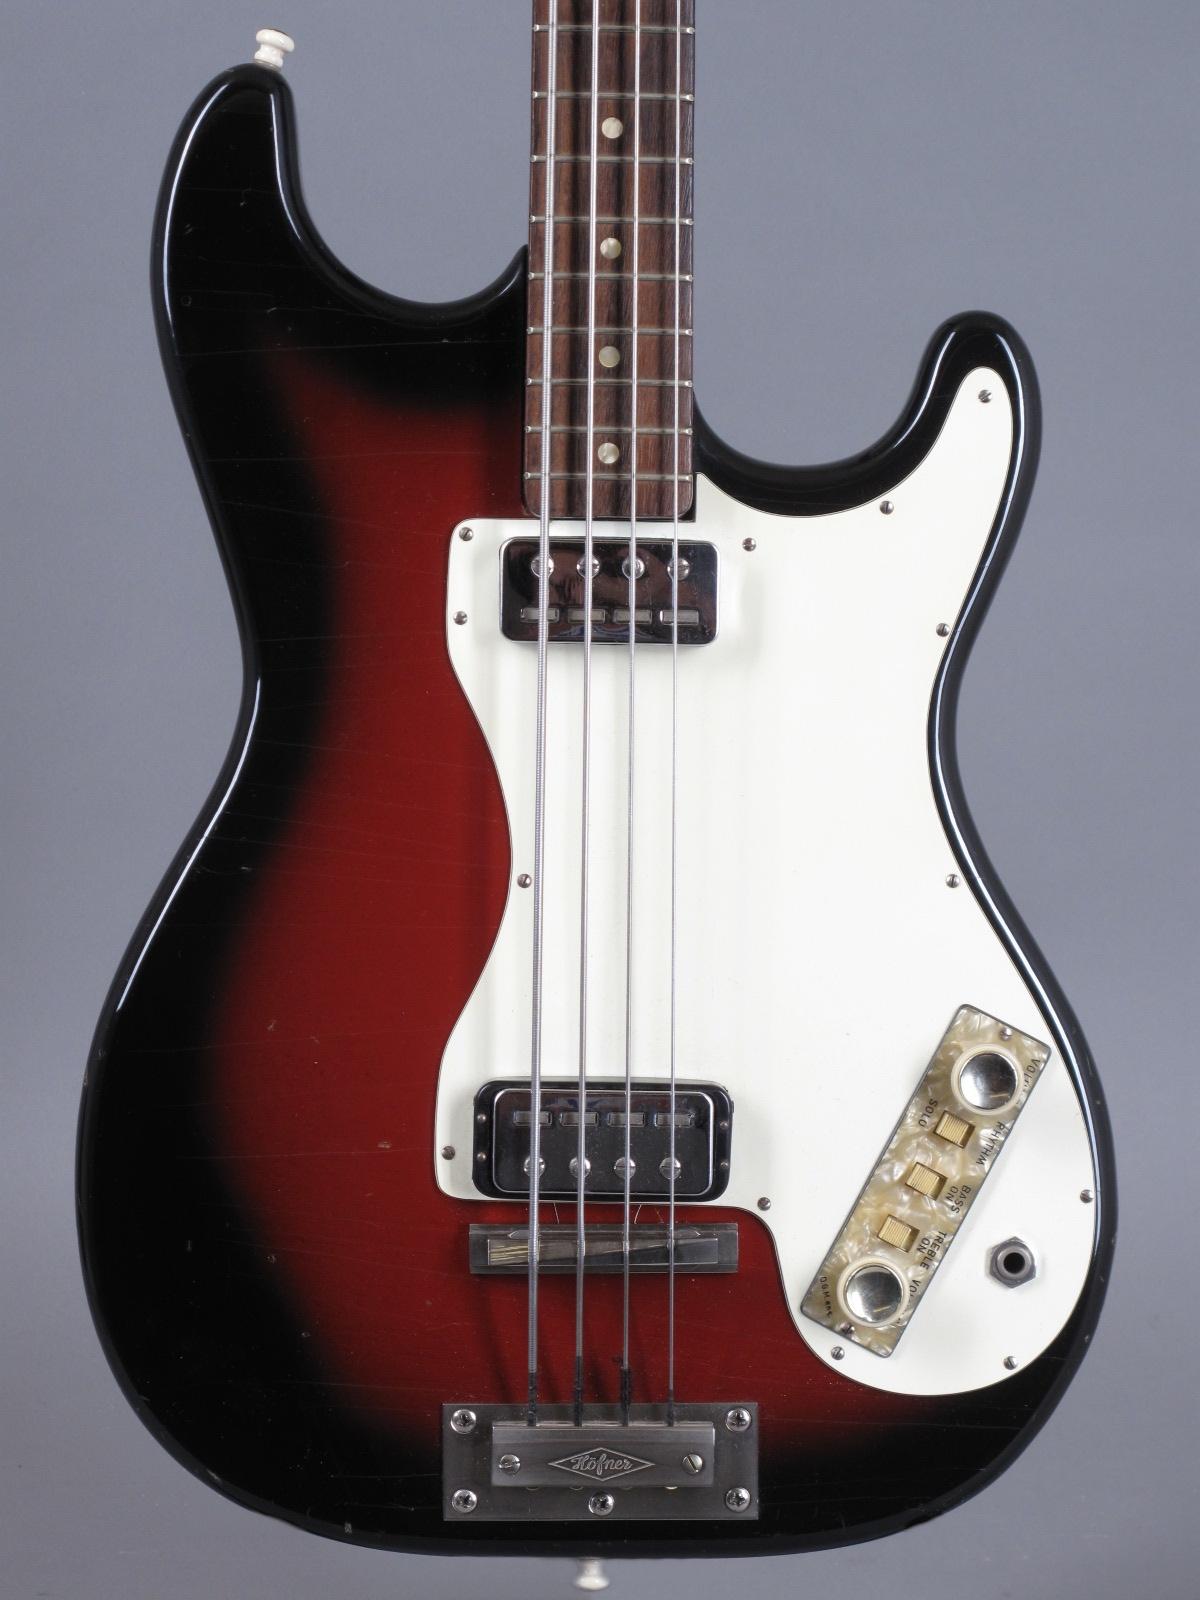 1965 Höfner Bass Modell 182 - Sunburst